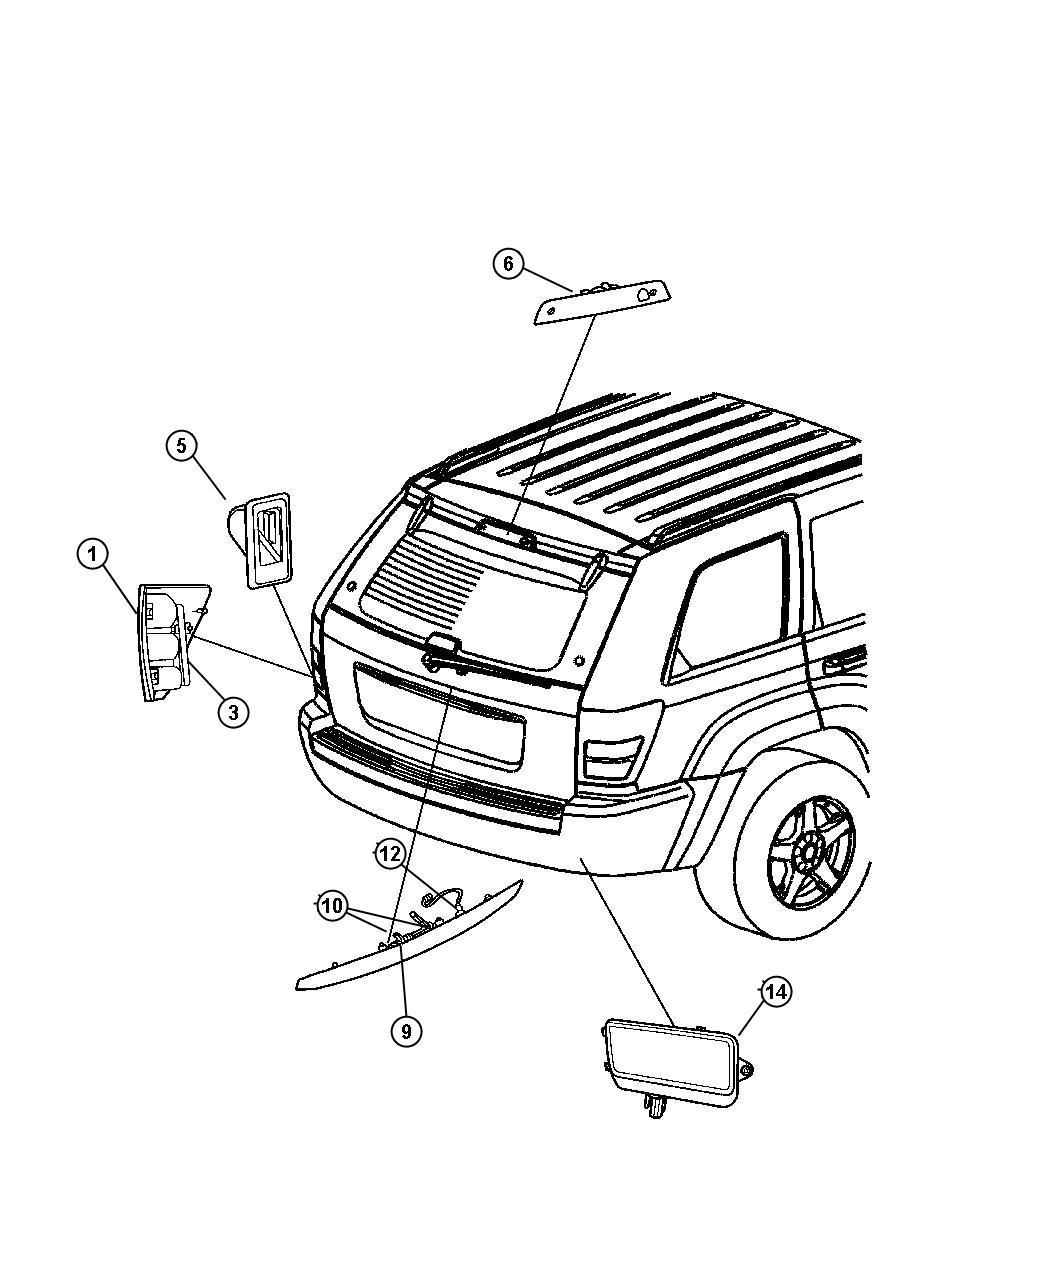 Jeep Grand Cherokee Lamp Left Tail Stop Turn Sidemarker